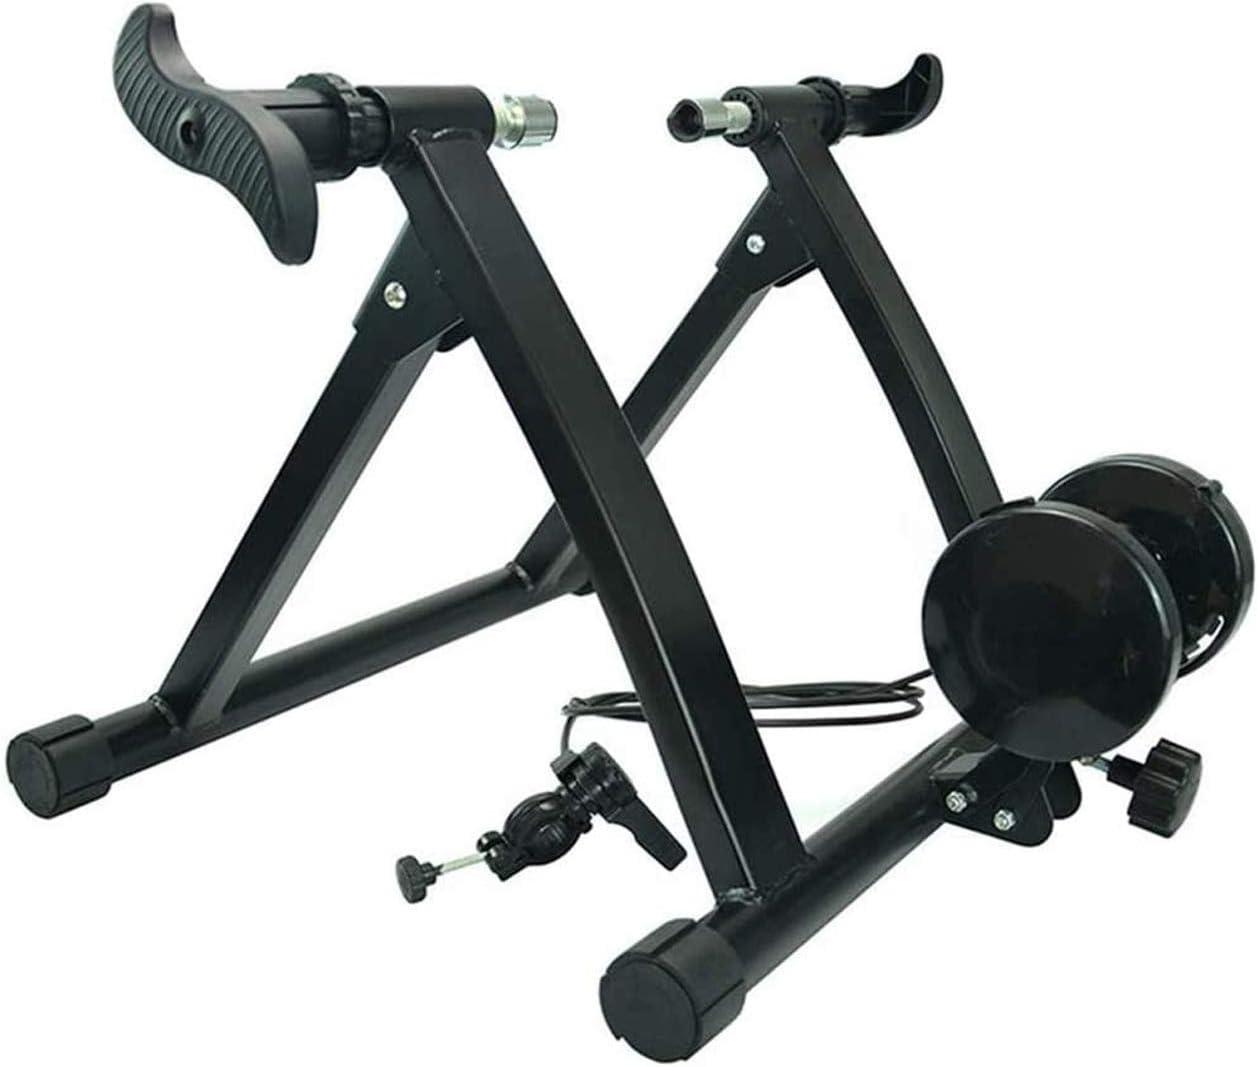 SJNQJJ Bike Trainer Stand Foldable Indoor Tur Level Popular standard Resistance 7 Limited time trial price